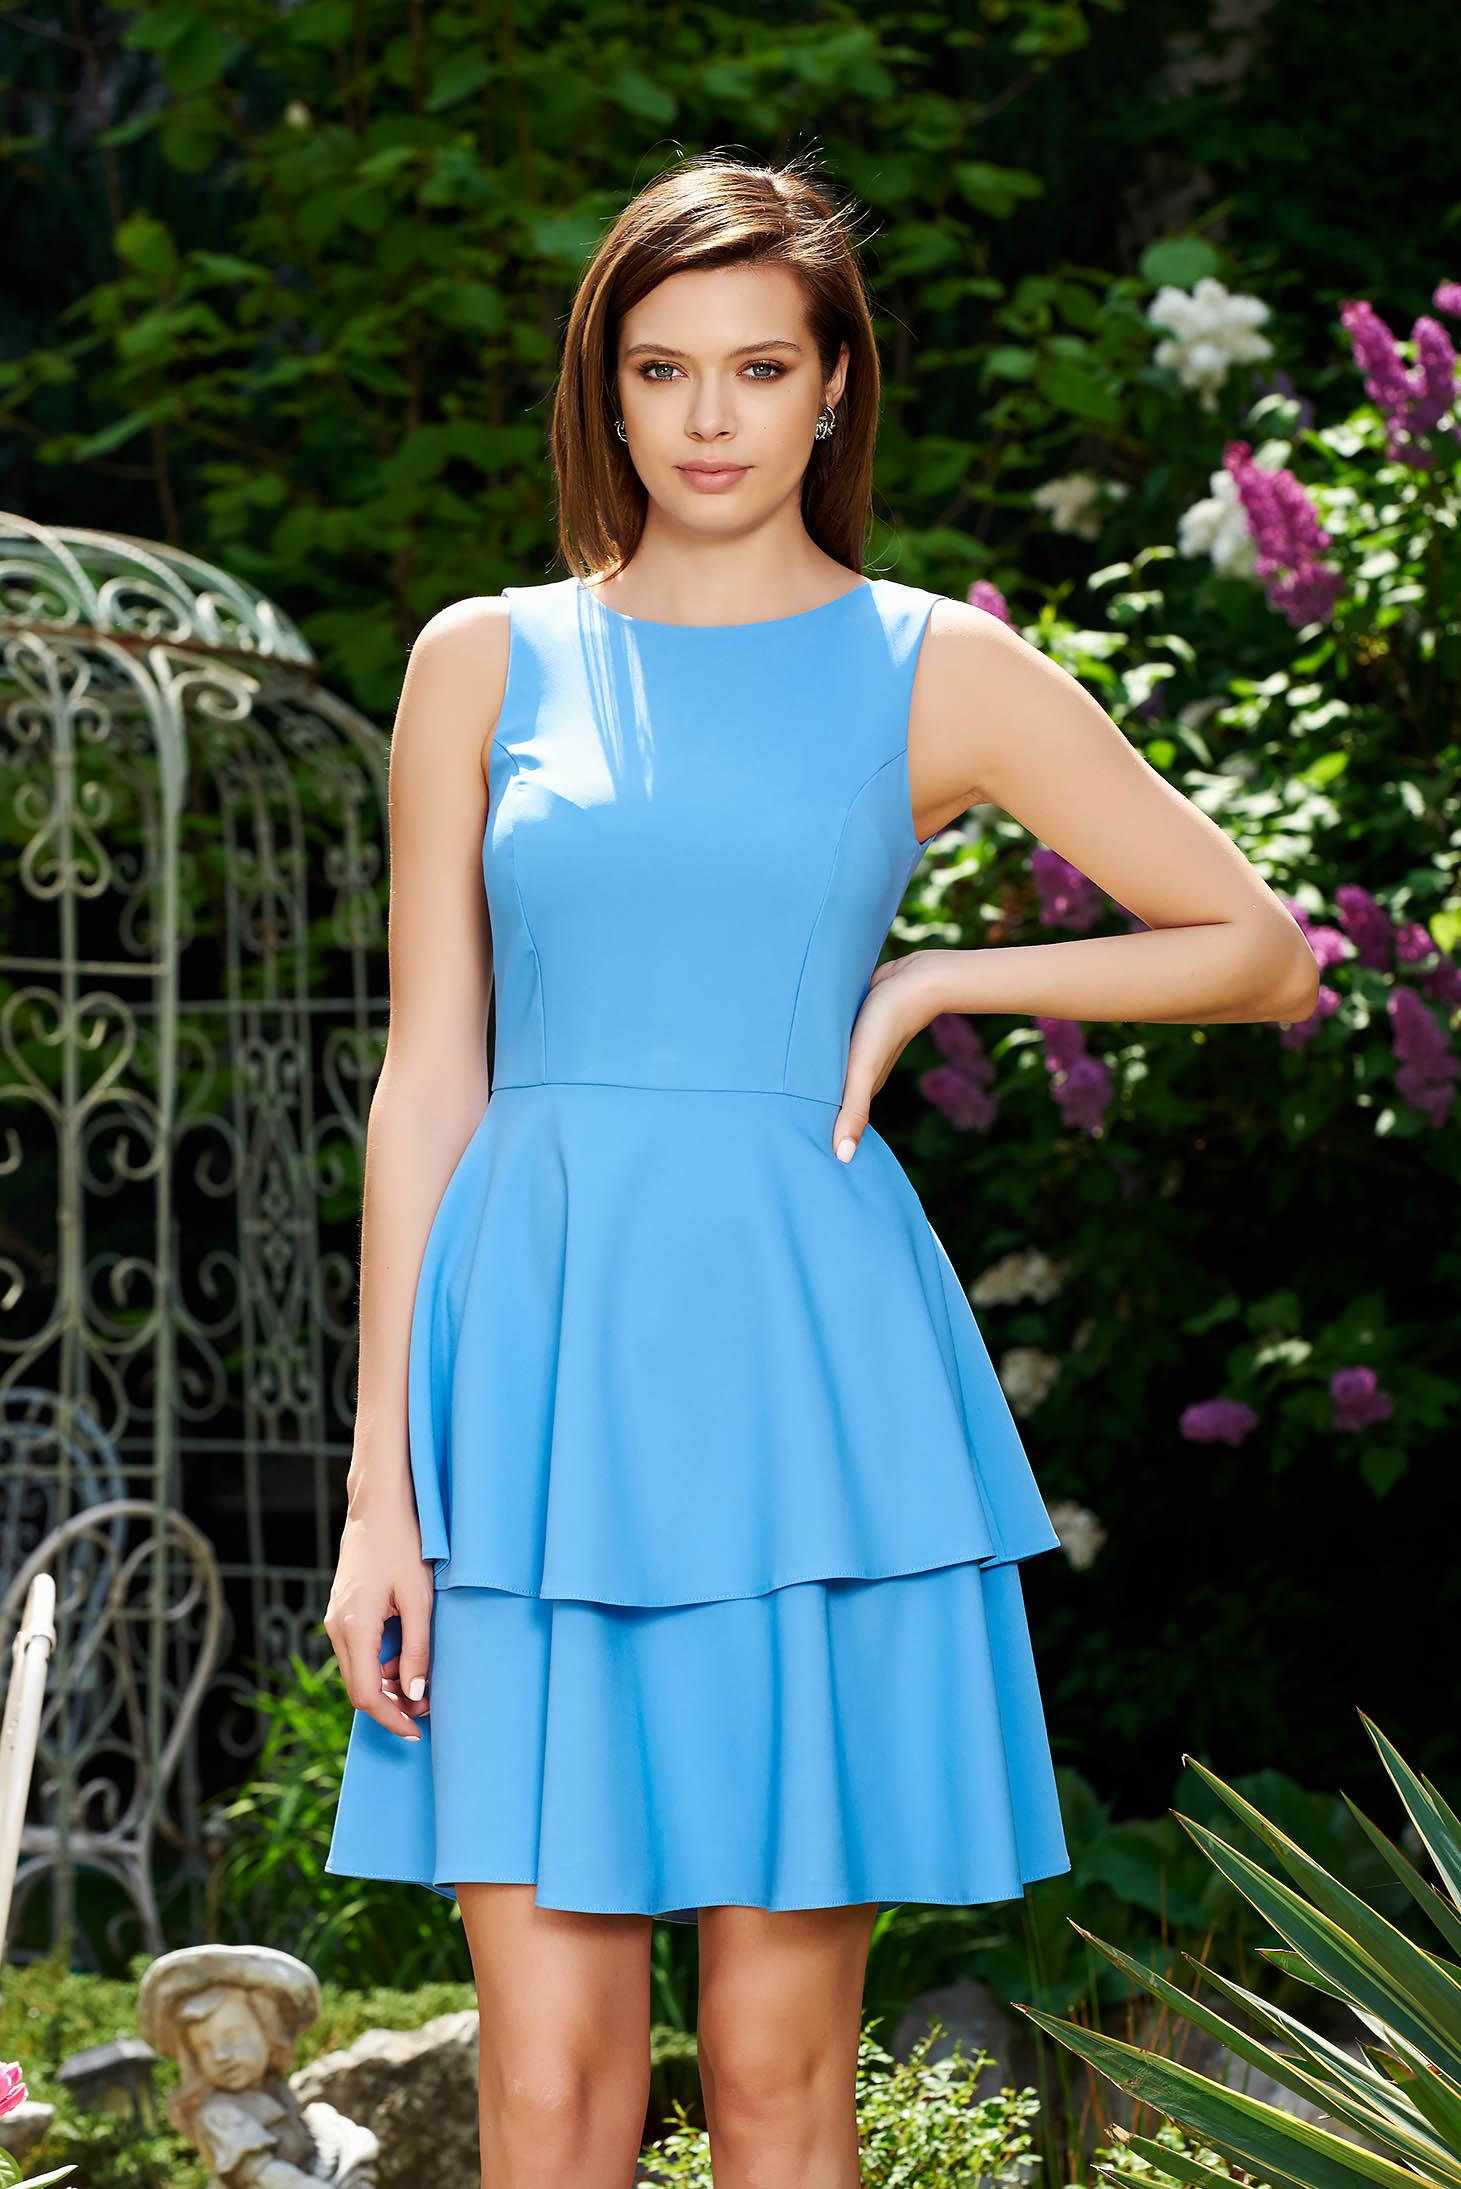 StarShinerS blue elegant cloche dress slightly elastic fabric with ruffle details